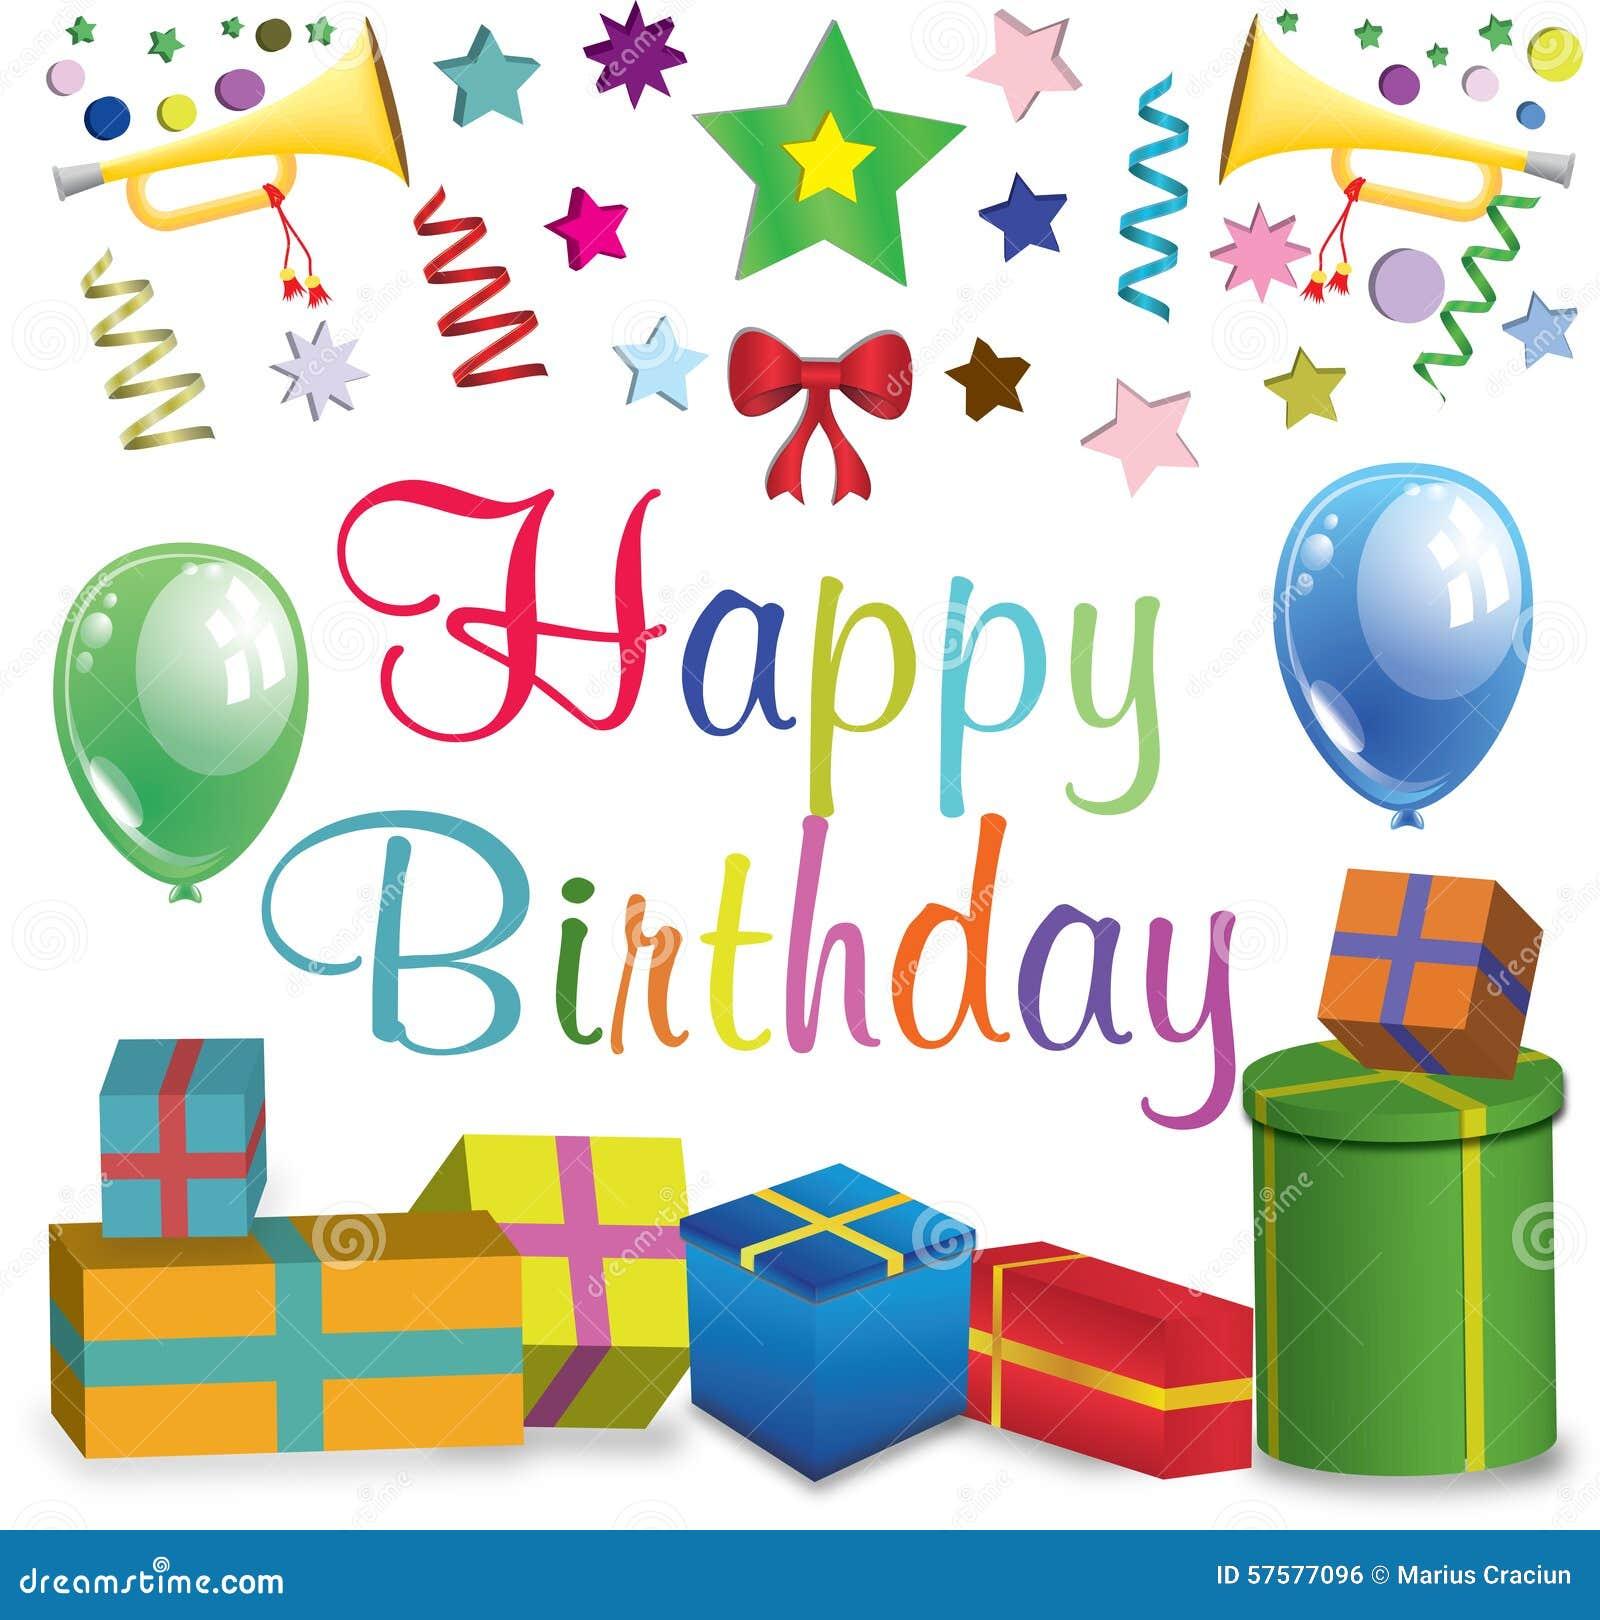 Happy Birthday Poster Stock Illustration. Illustration Of